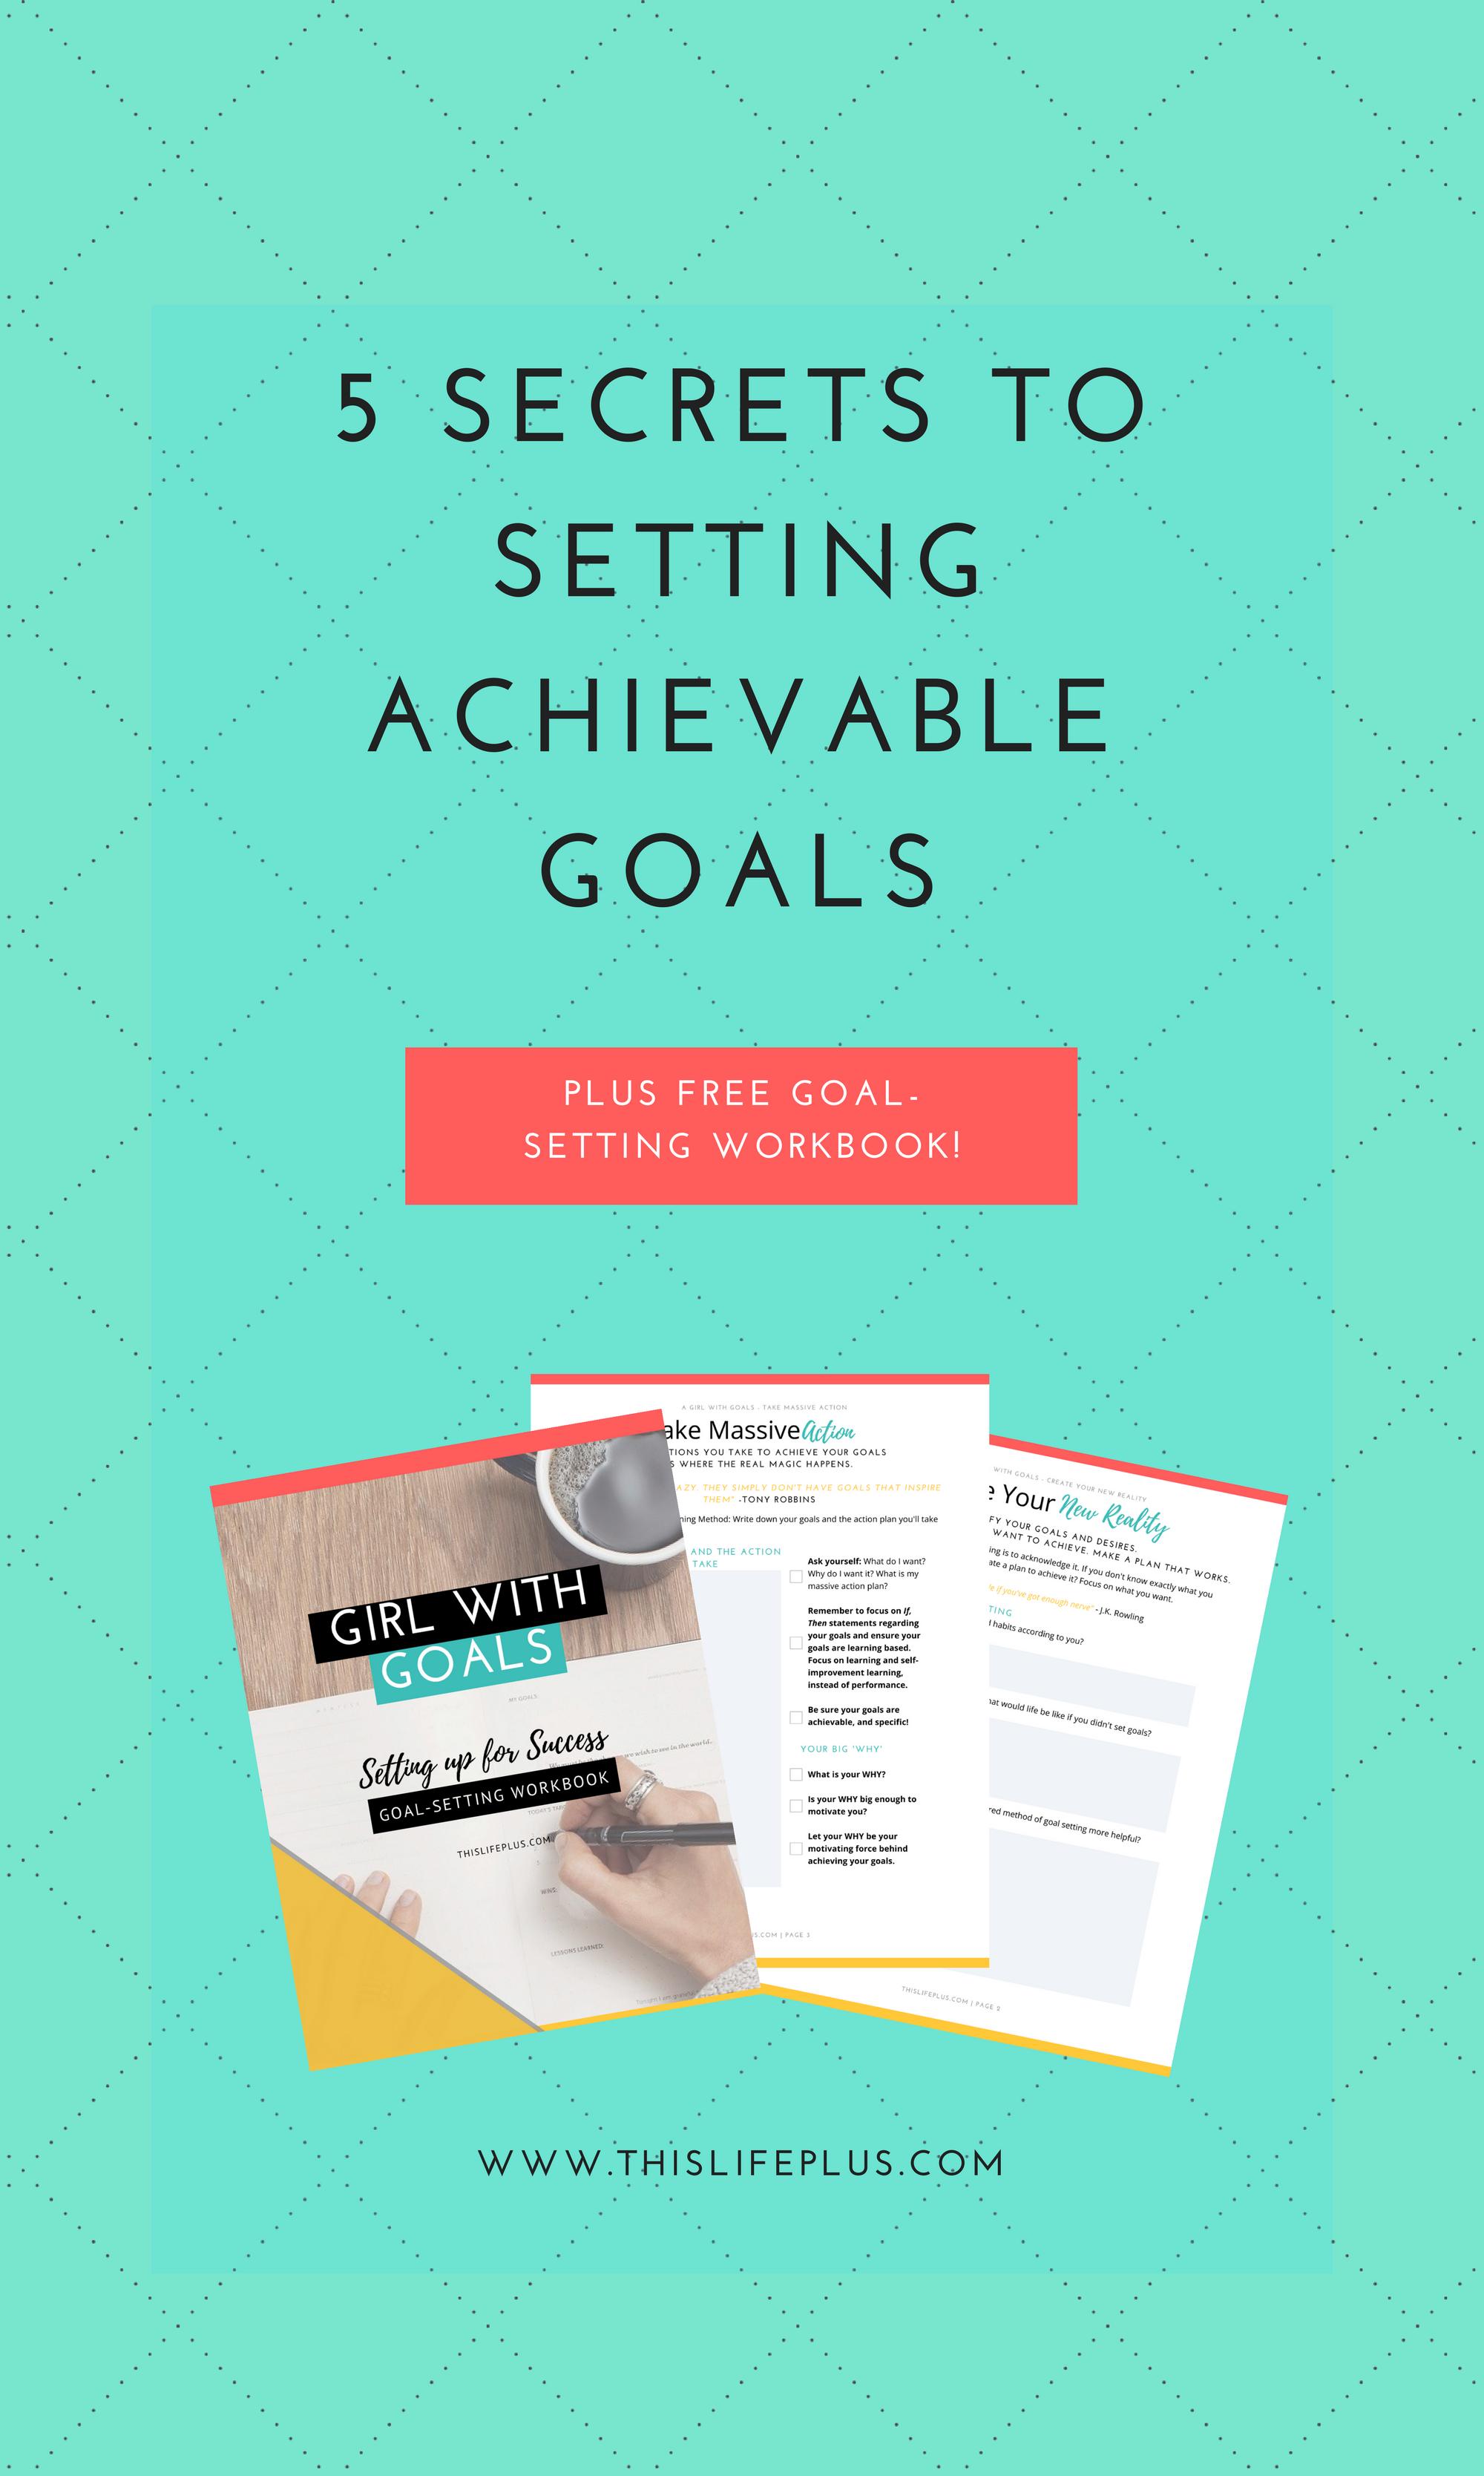 5 Secrets To Setting Achievable Goals Free Workbook